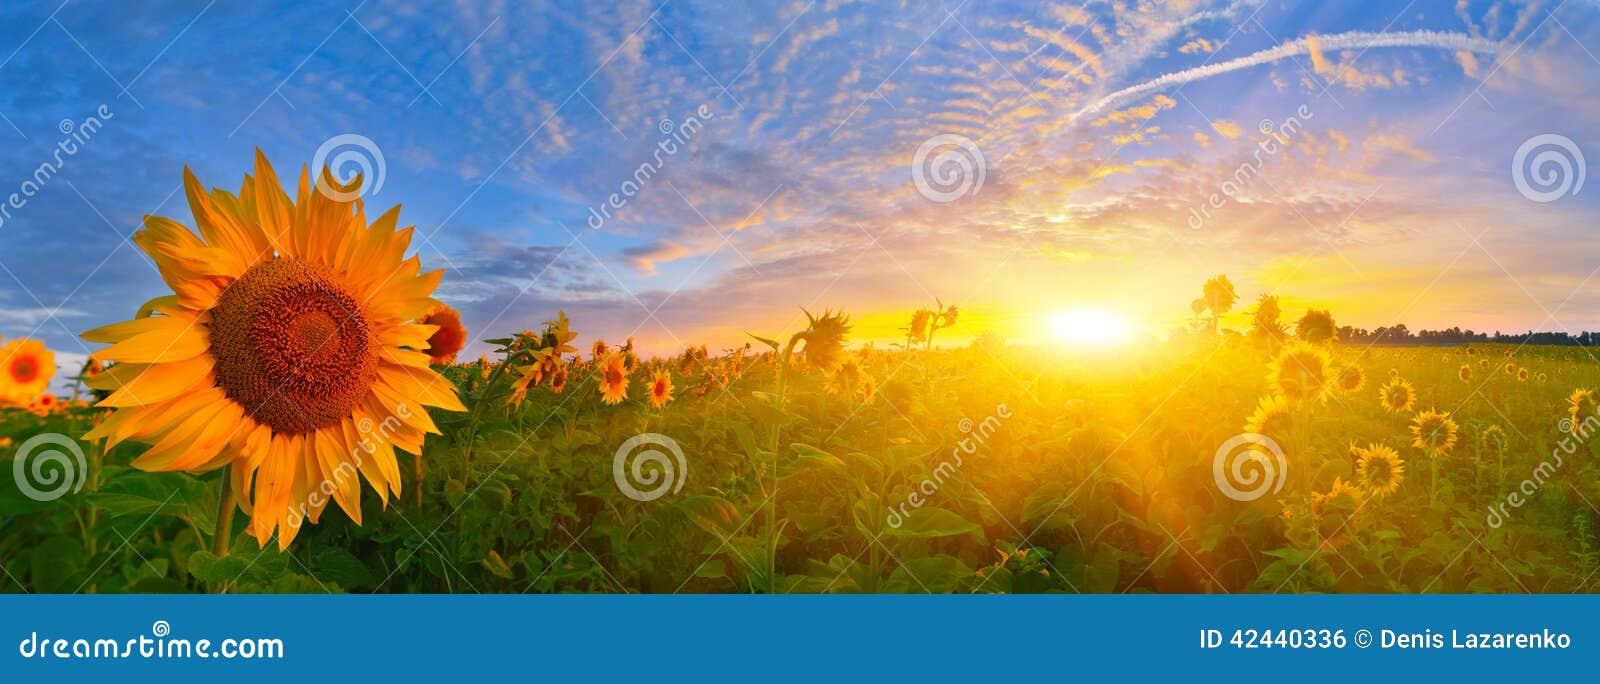 Girasoles de la salida del sol